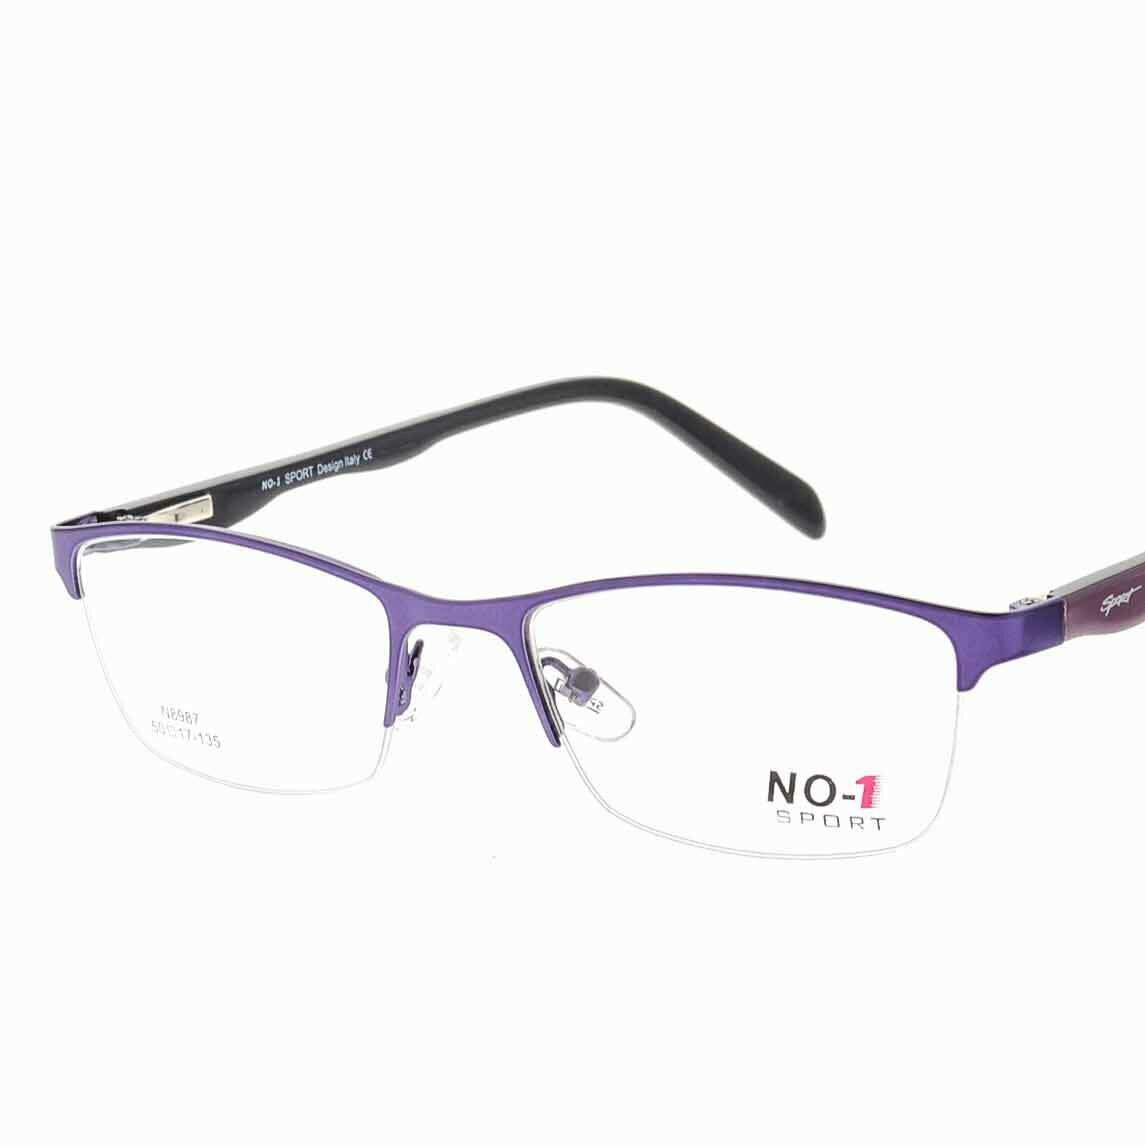 NO-1 SPORT N8987